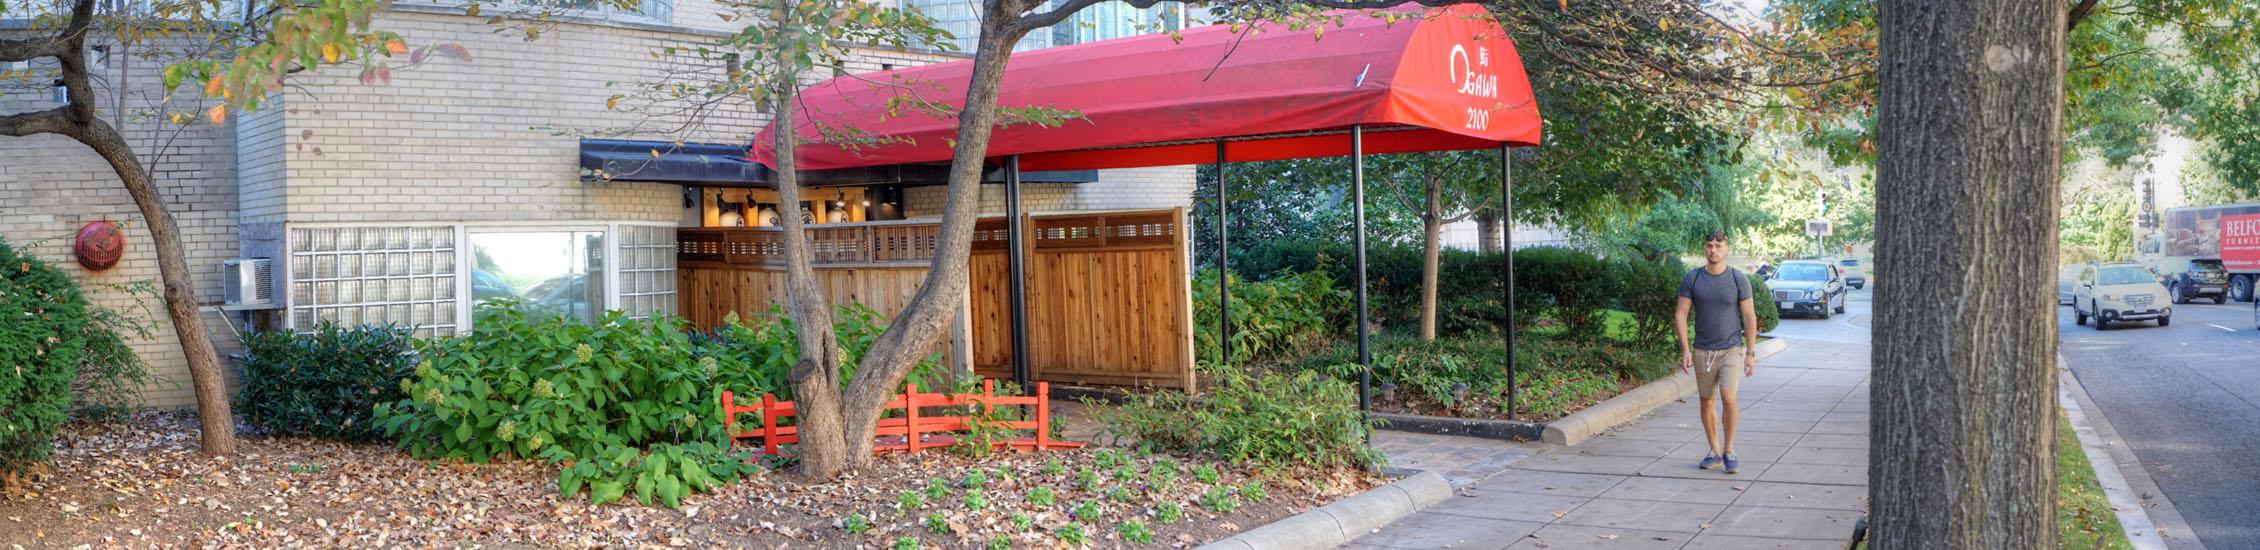 Sushi Ogawa Exterior